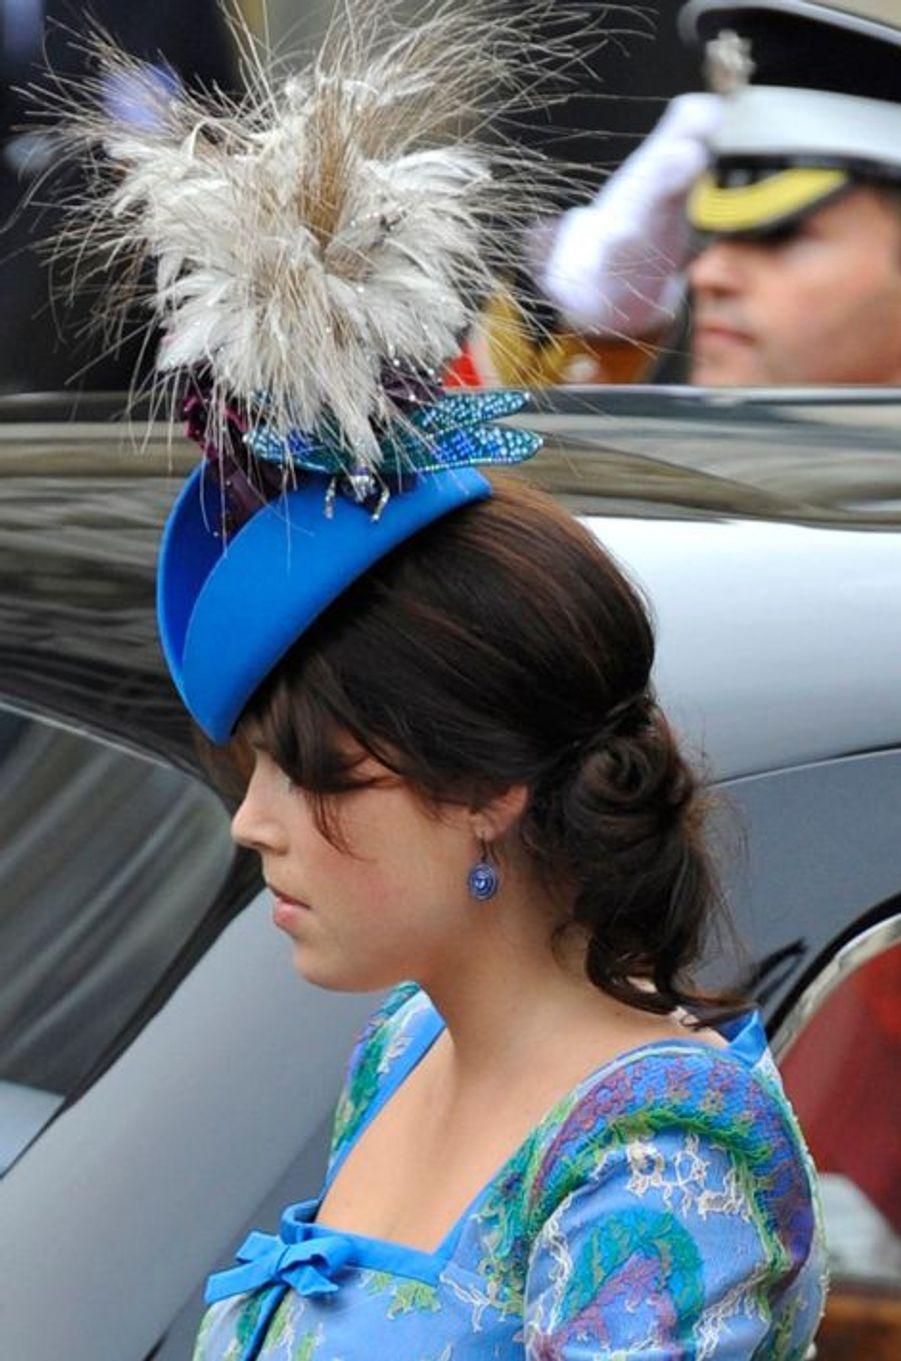 La princesse Beatrice d'York, le 29 avril 2011